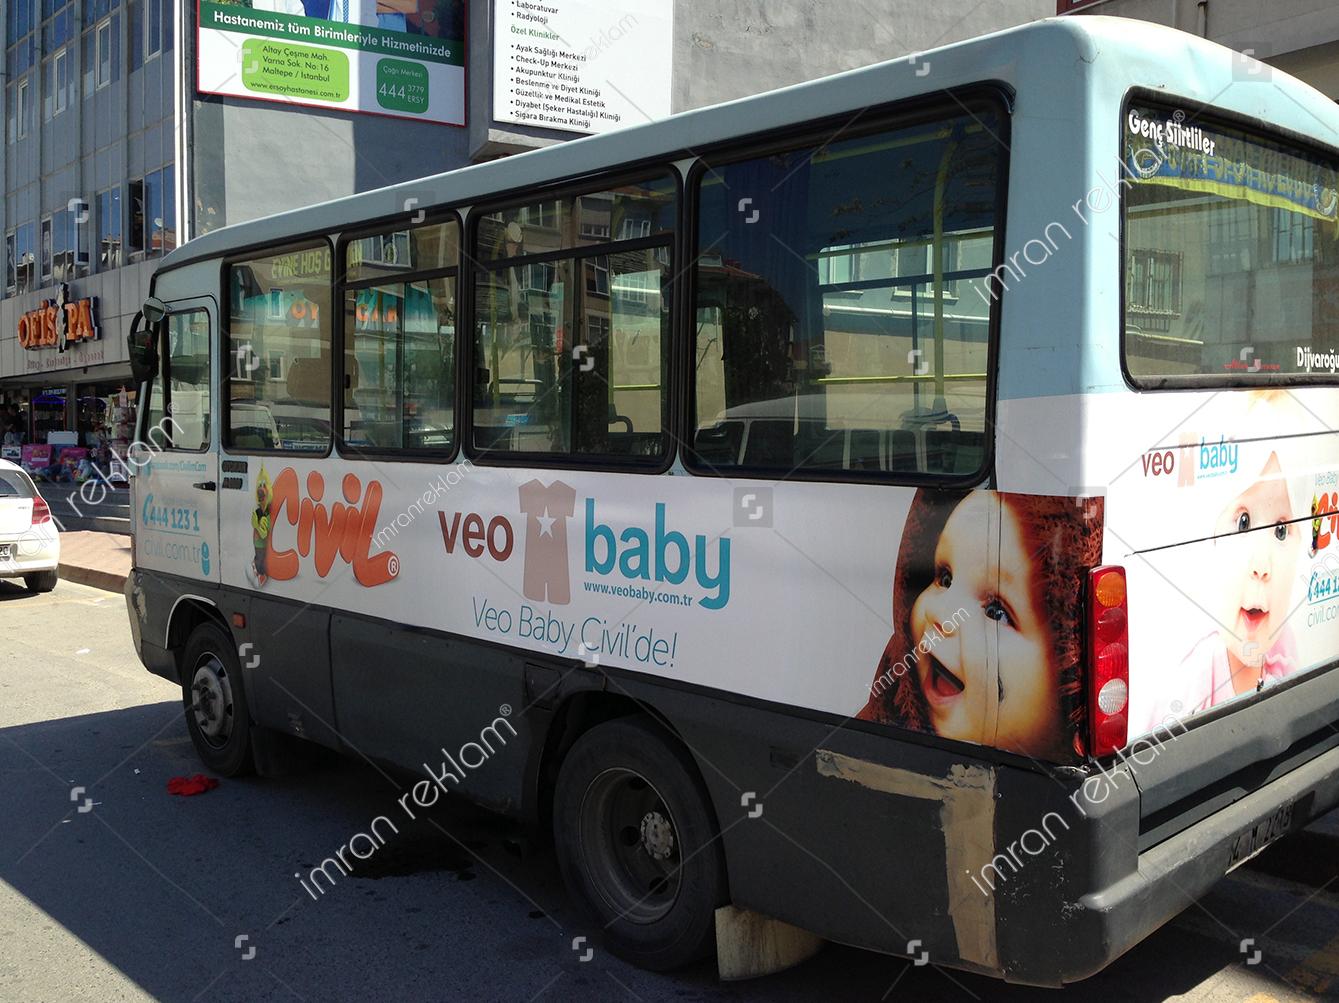 hatli-minibus-reklam-kaplama-ornekleri